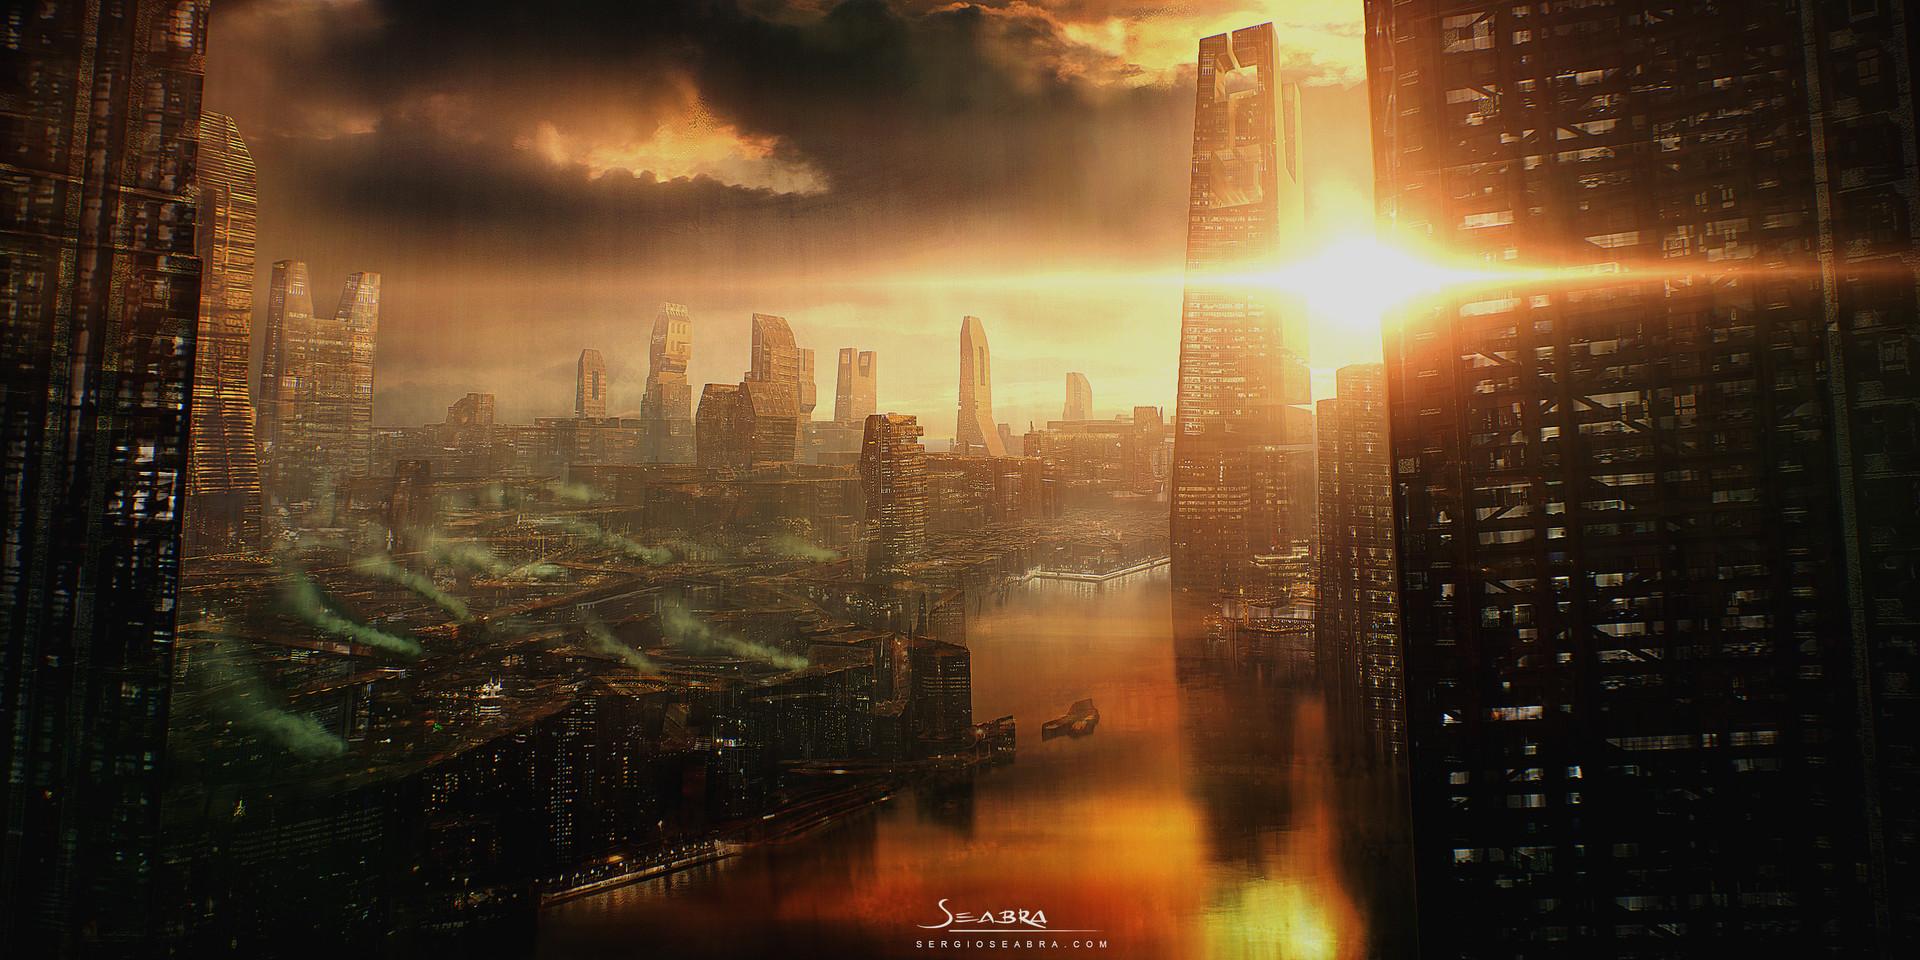 Sergio seabra 2016 02 ext sci fi shot1 ss